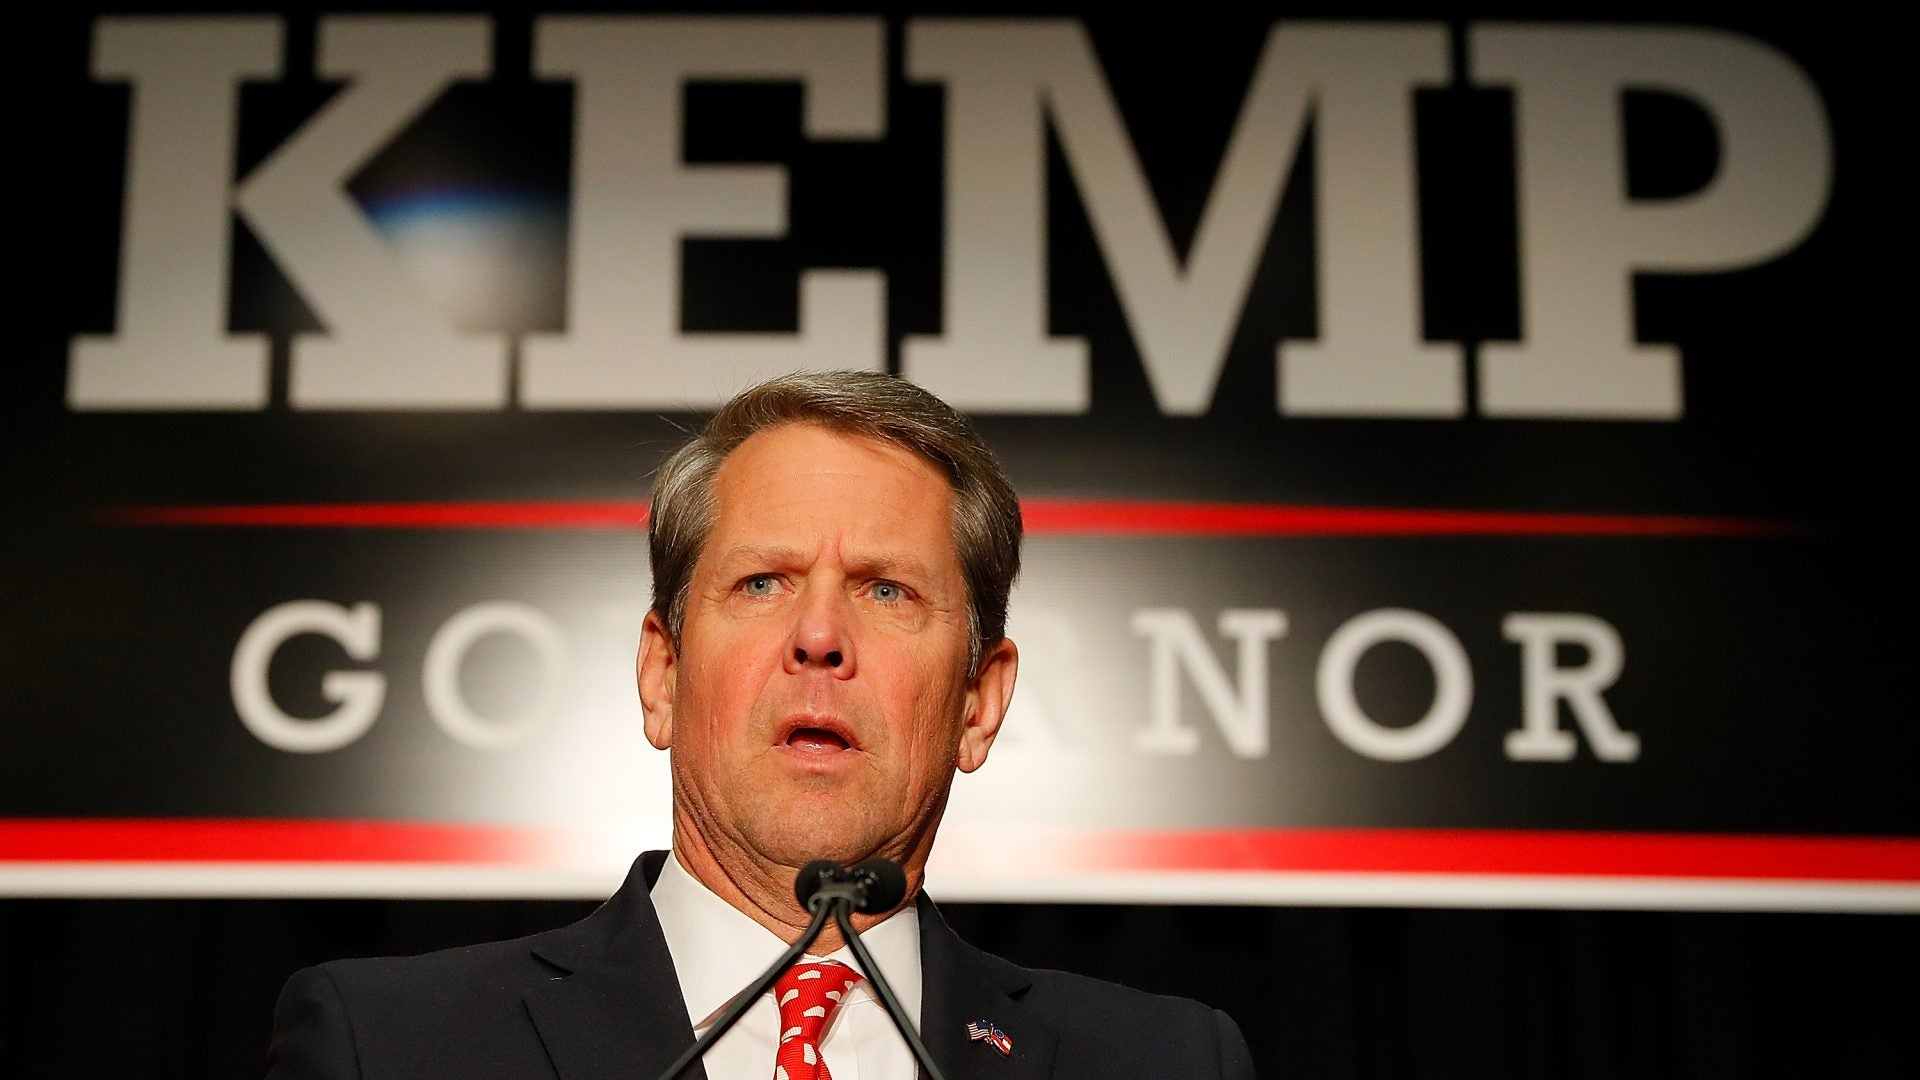 Georgia Gov. Brian Kemp Forbids Mask Mandates Amid Surge In COVID-19 Cases